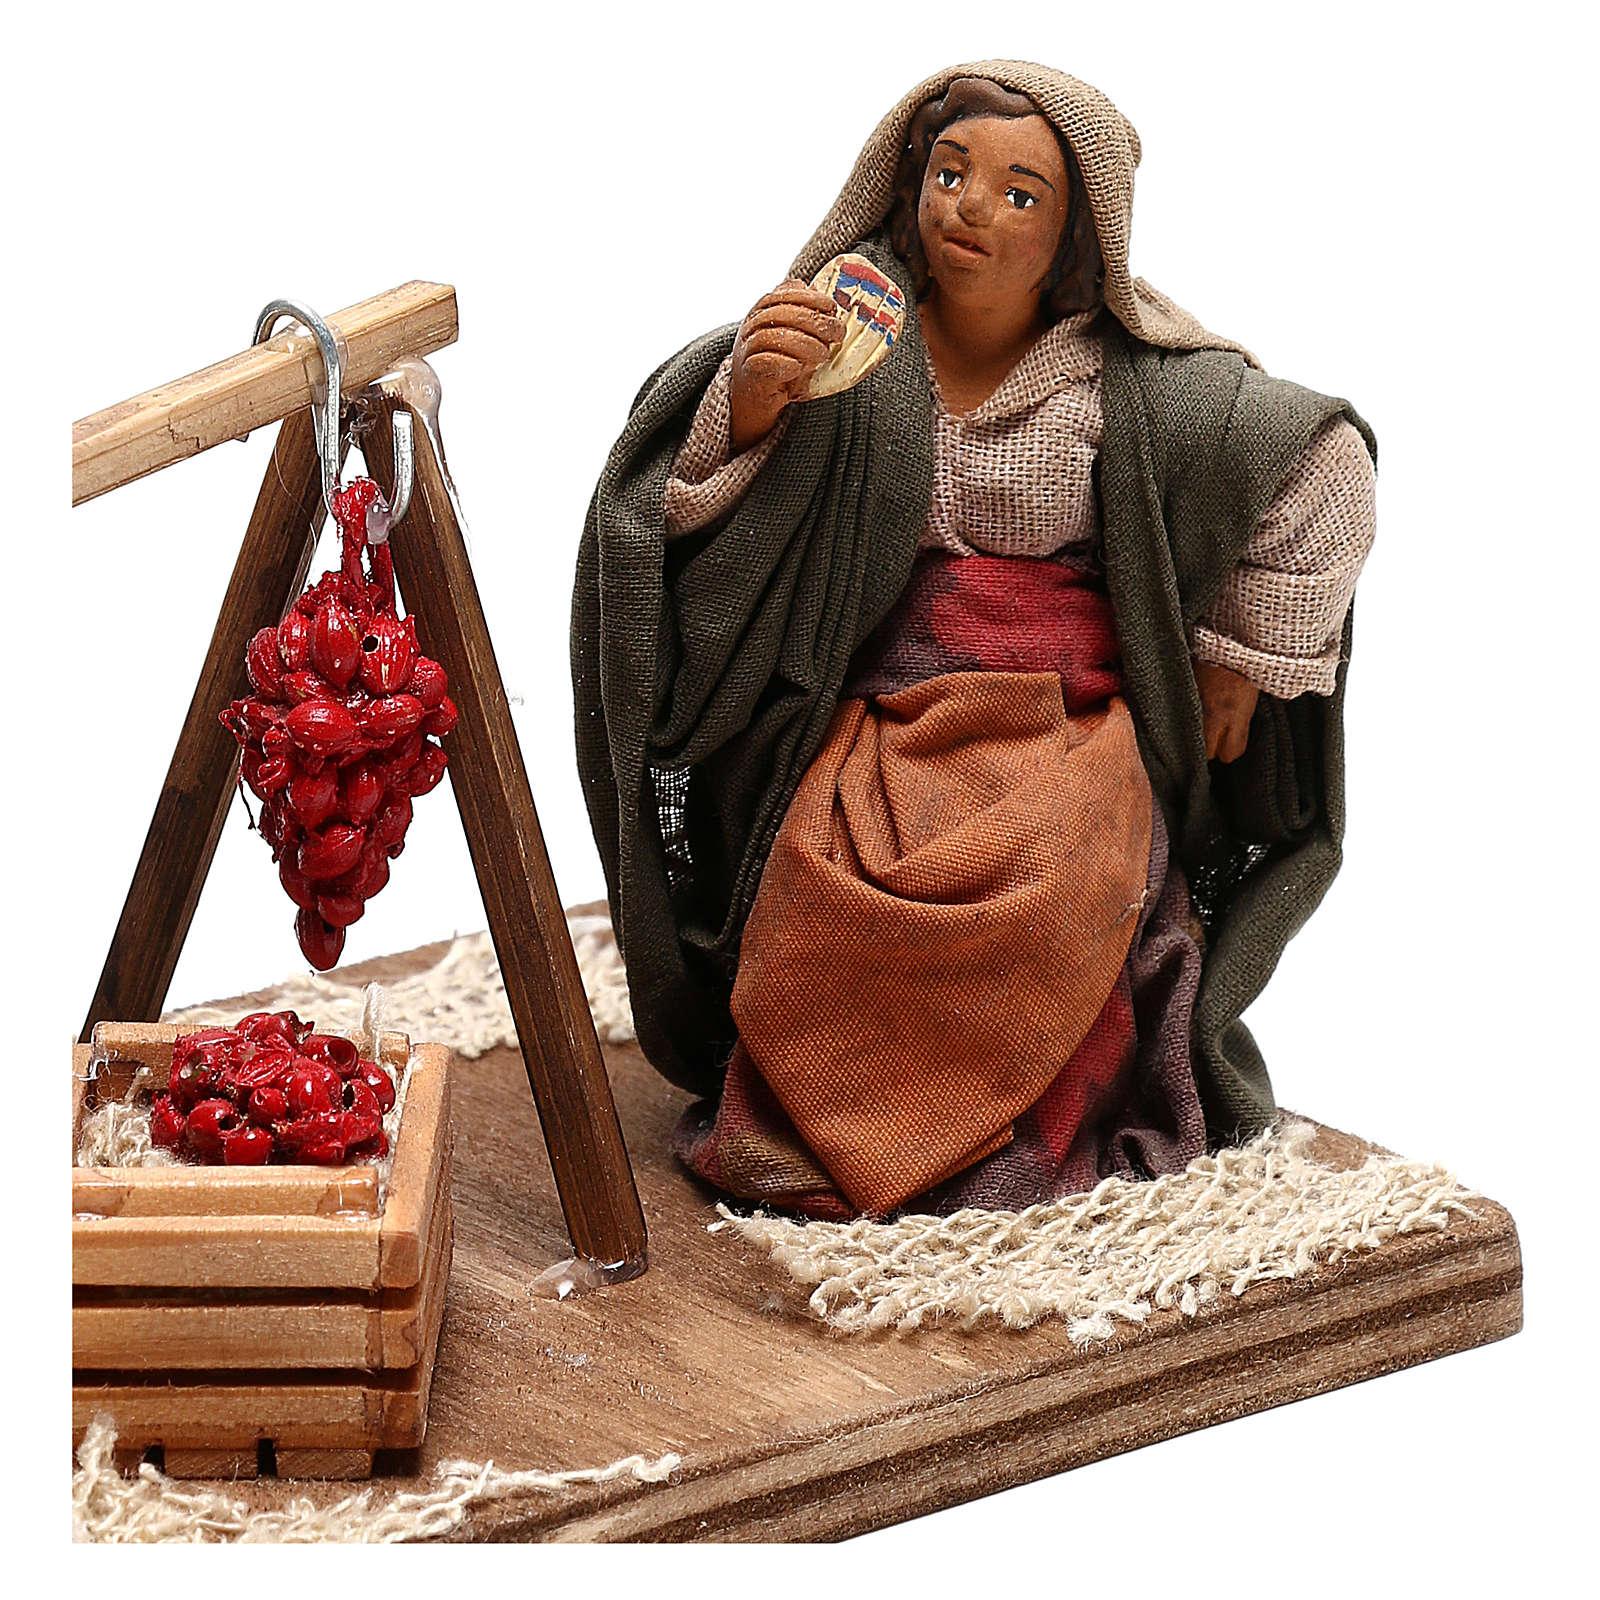 Tomato sellers 10cm, Neapolitan Nativity figurines 4